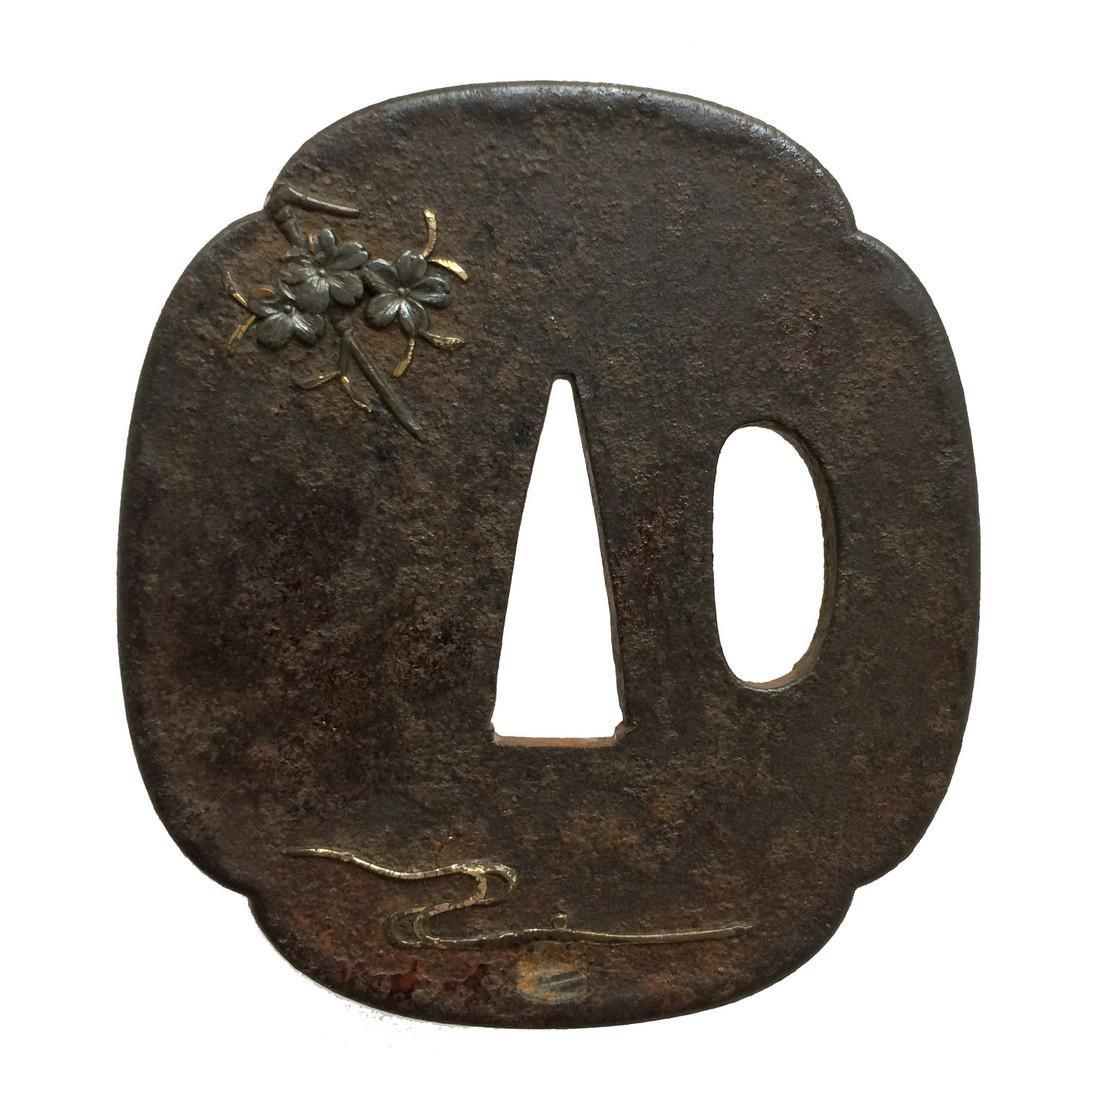 Iron tsuba with shibuichi inlay - 2